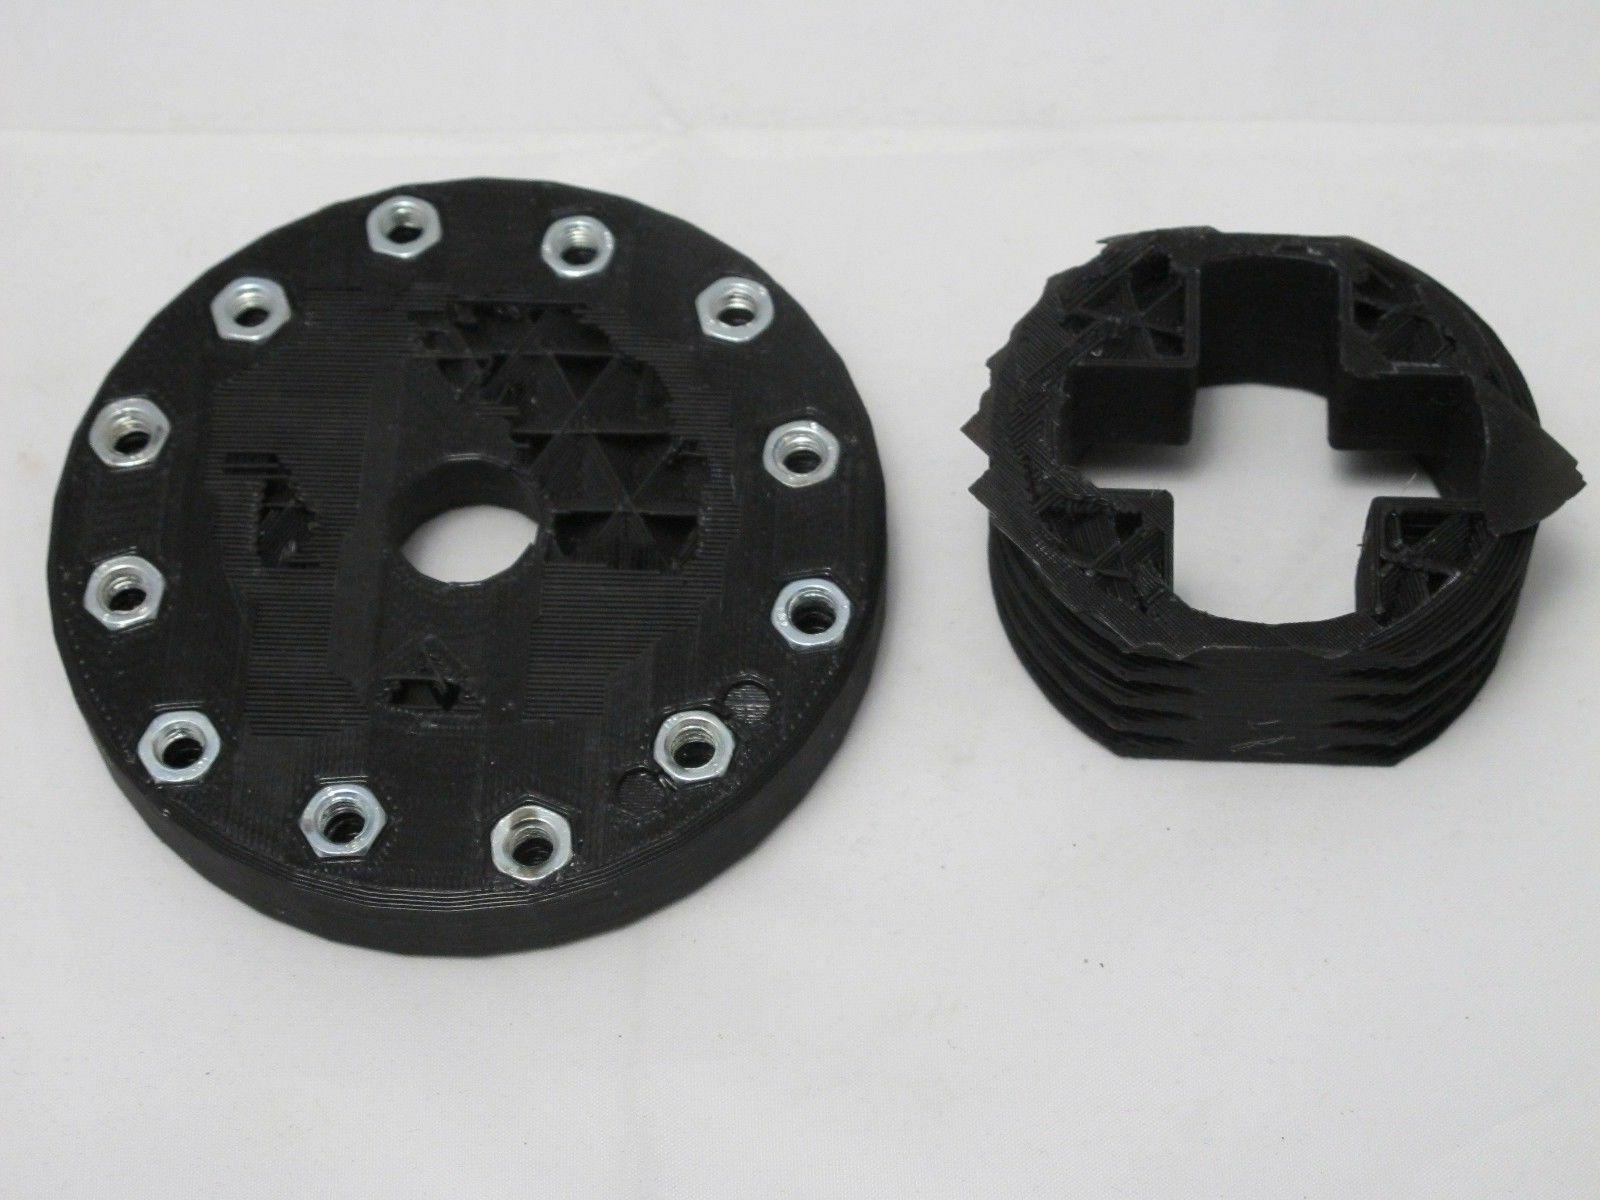 BEST Aluminum Steering Wheel Adapter Thrustmaster T300 P310